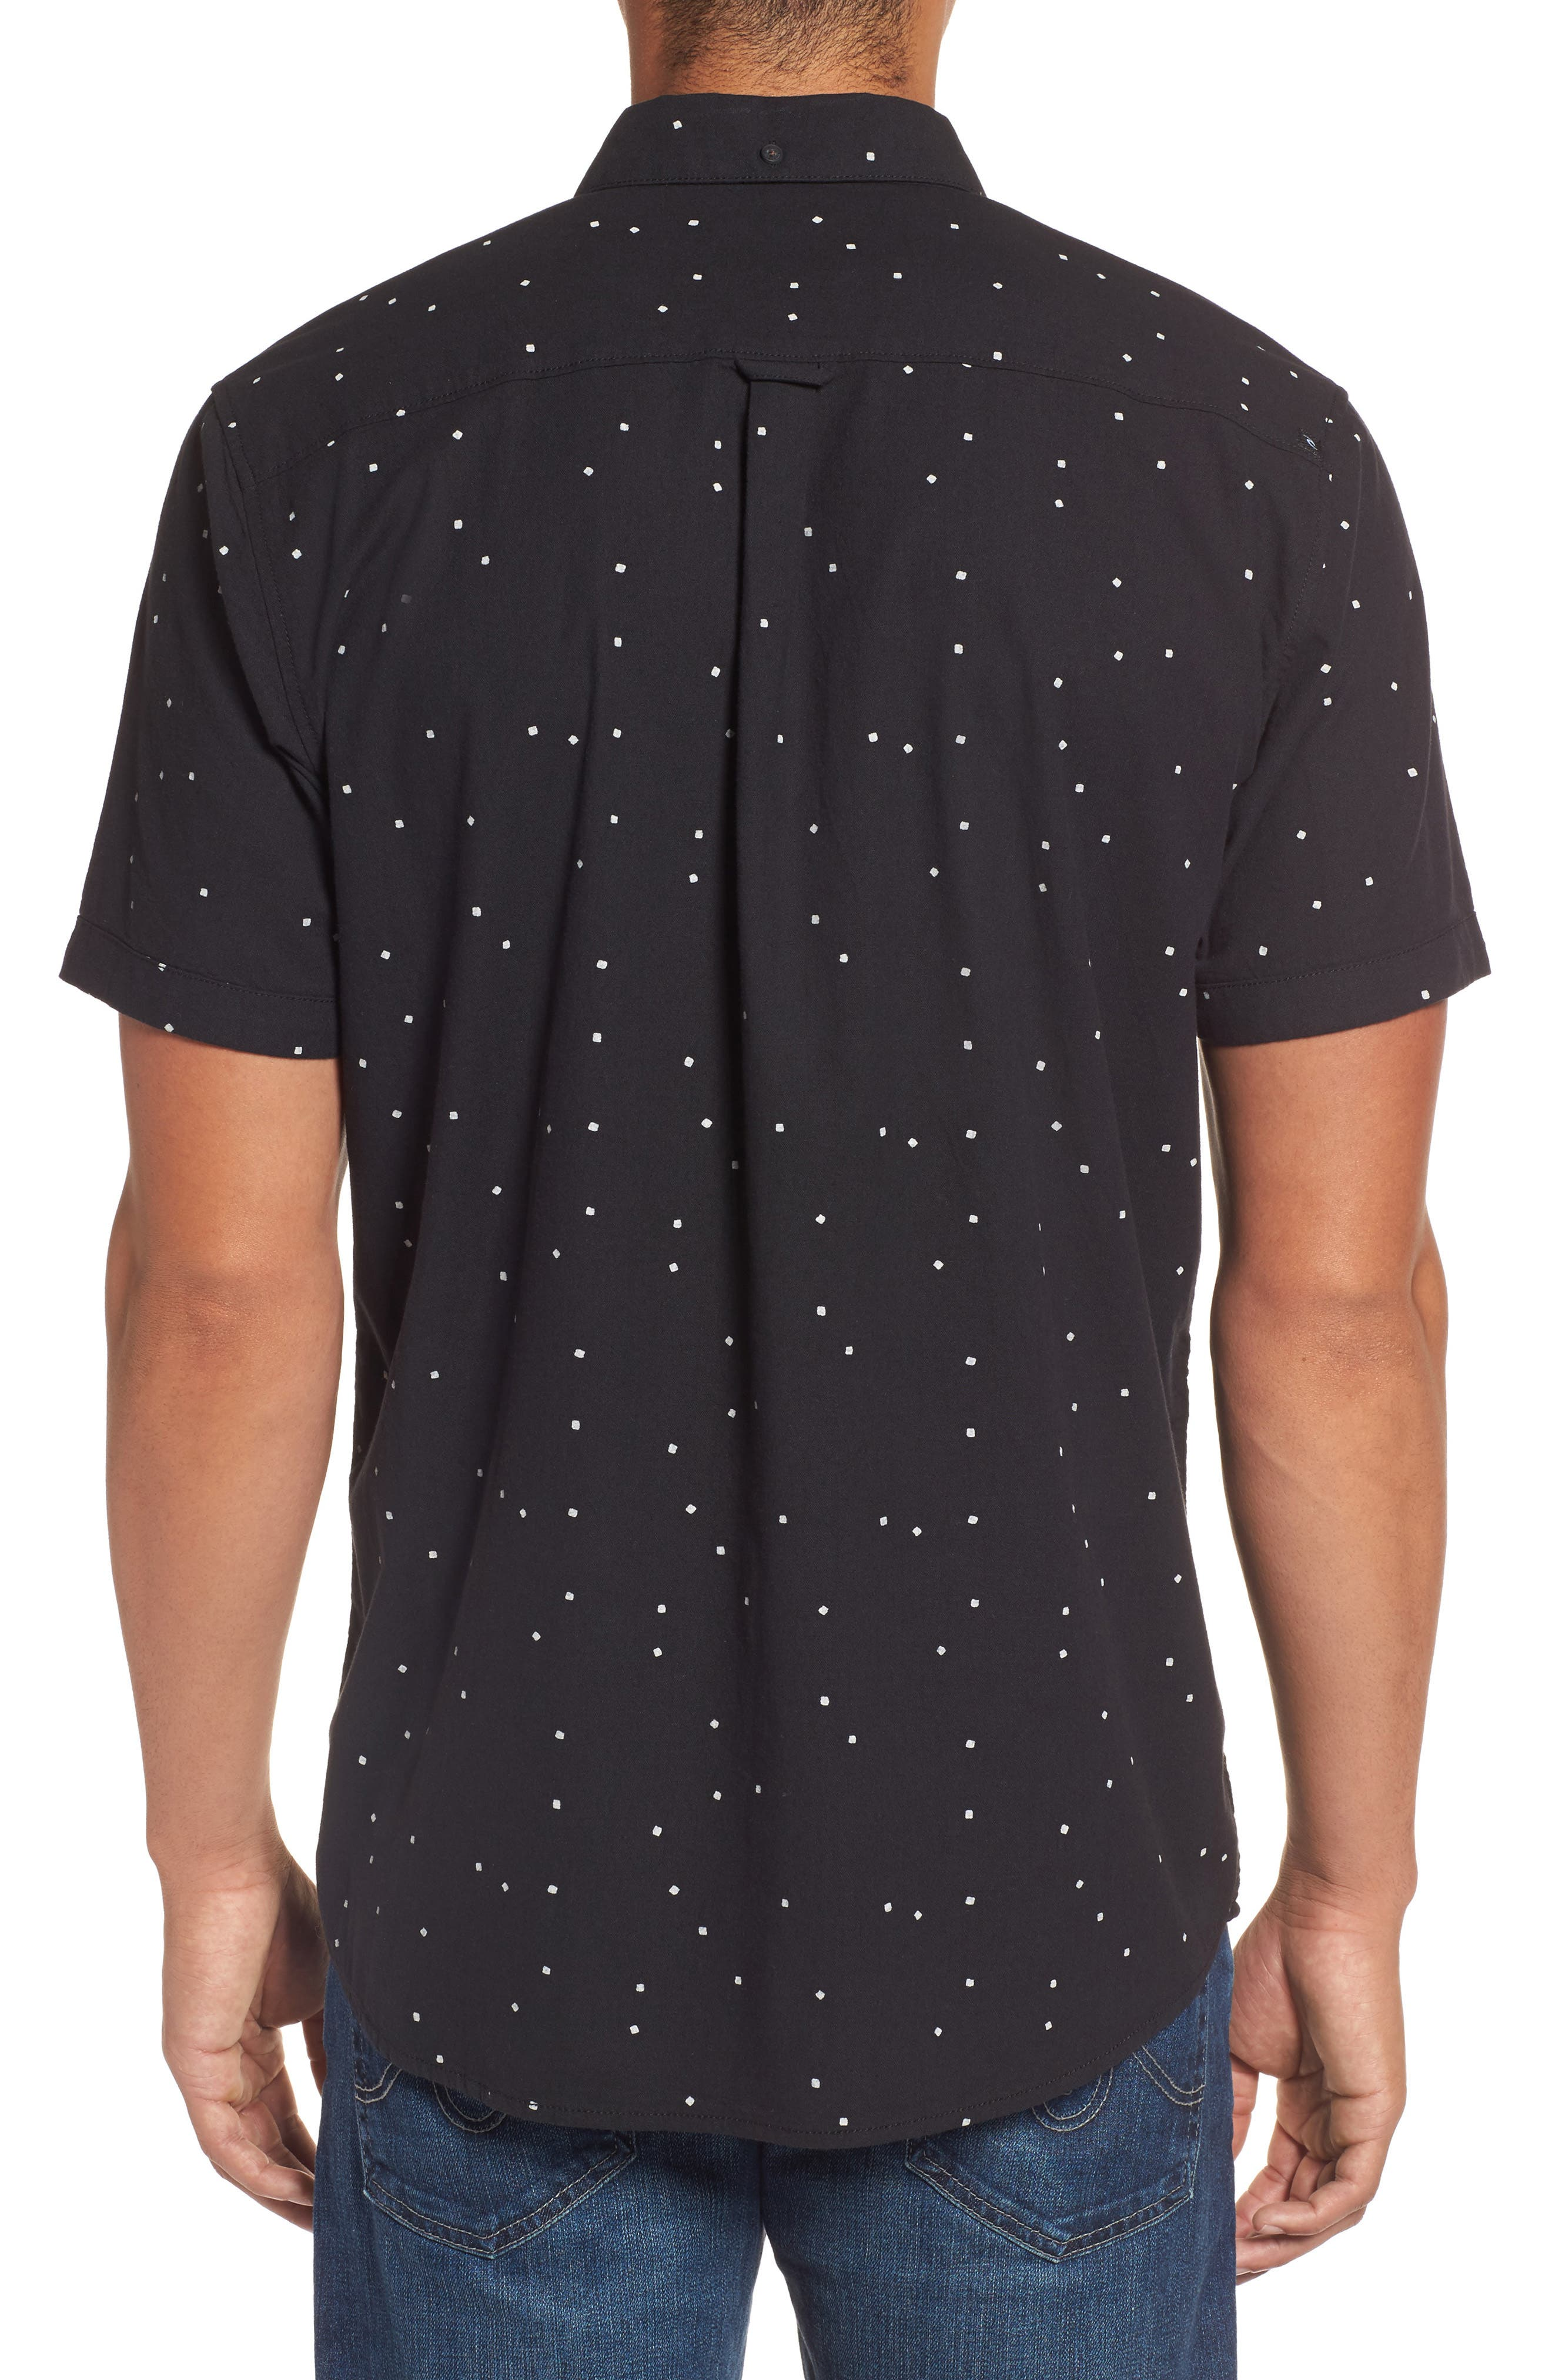 Mixter Short Sleeve Shirt,                             Alternate thumbnail 2, color,                             001